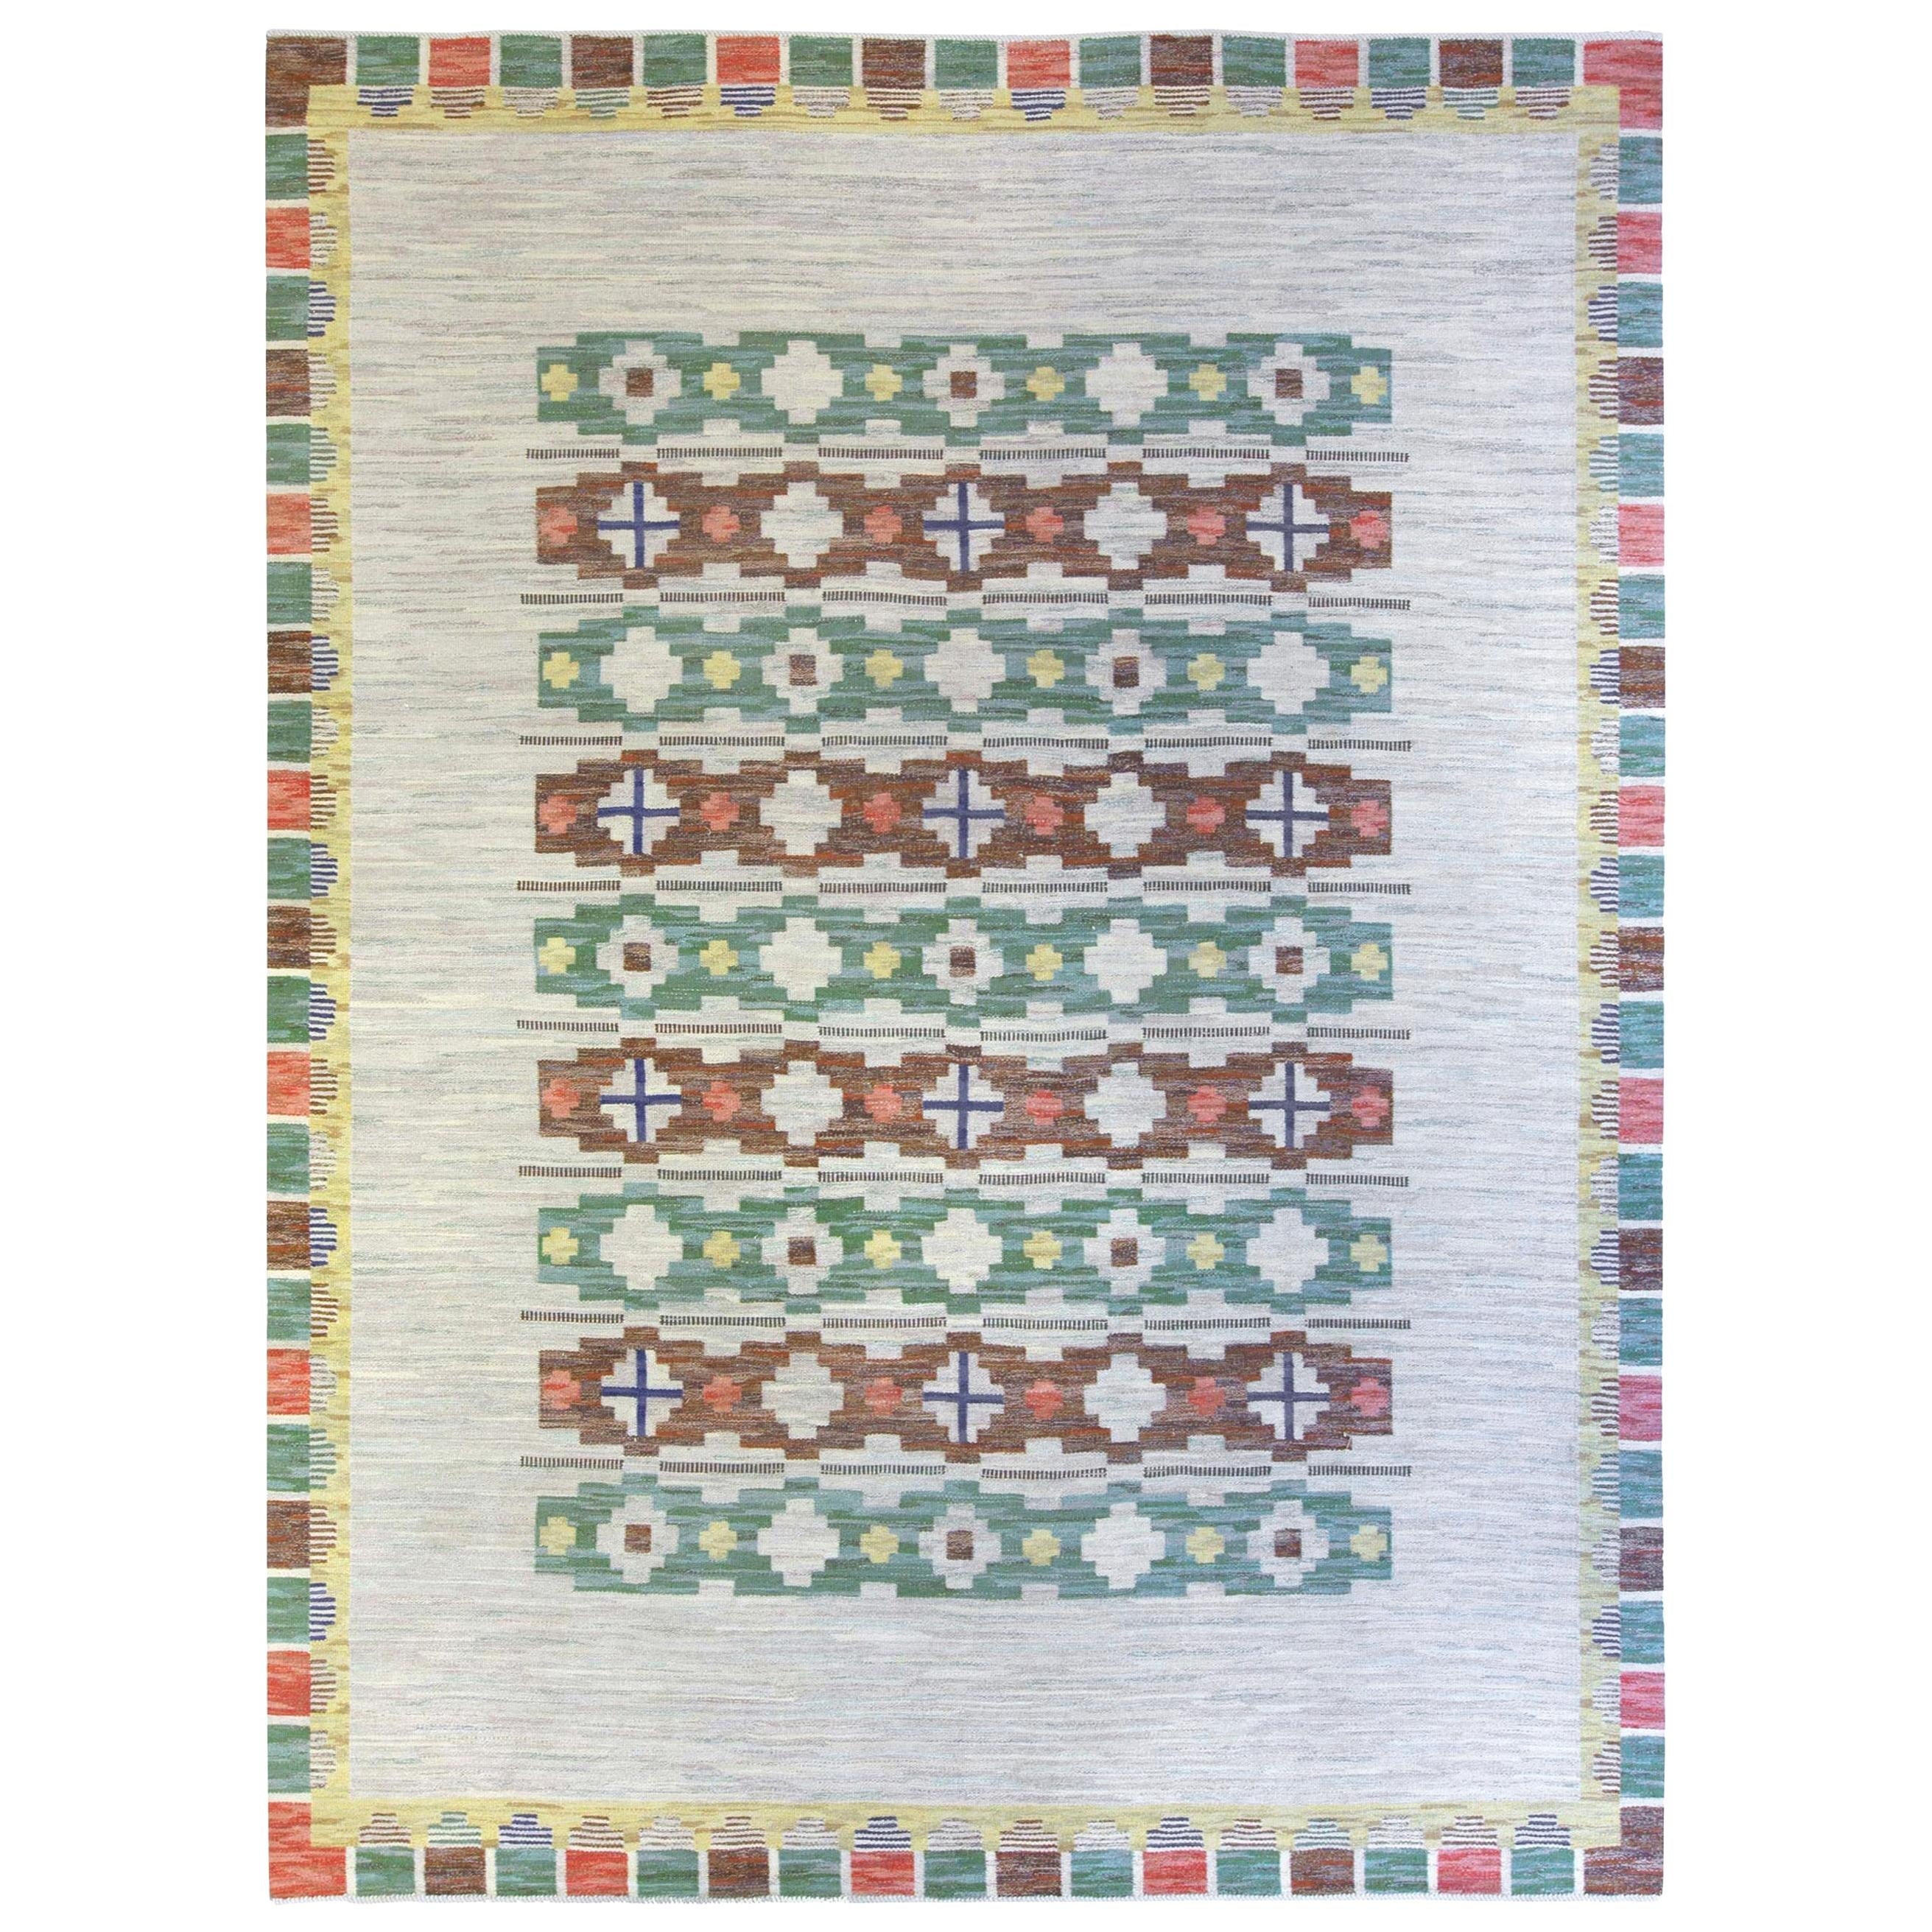 Midcentury Swedish Geometric Flat-Woven Wool Rug in Light Blue, Green and Brown